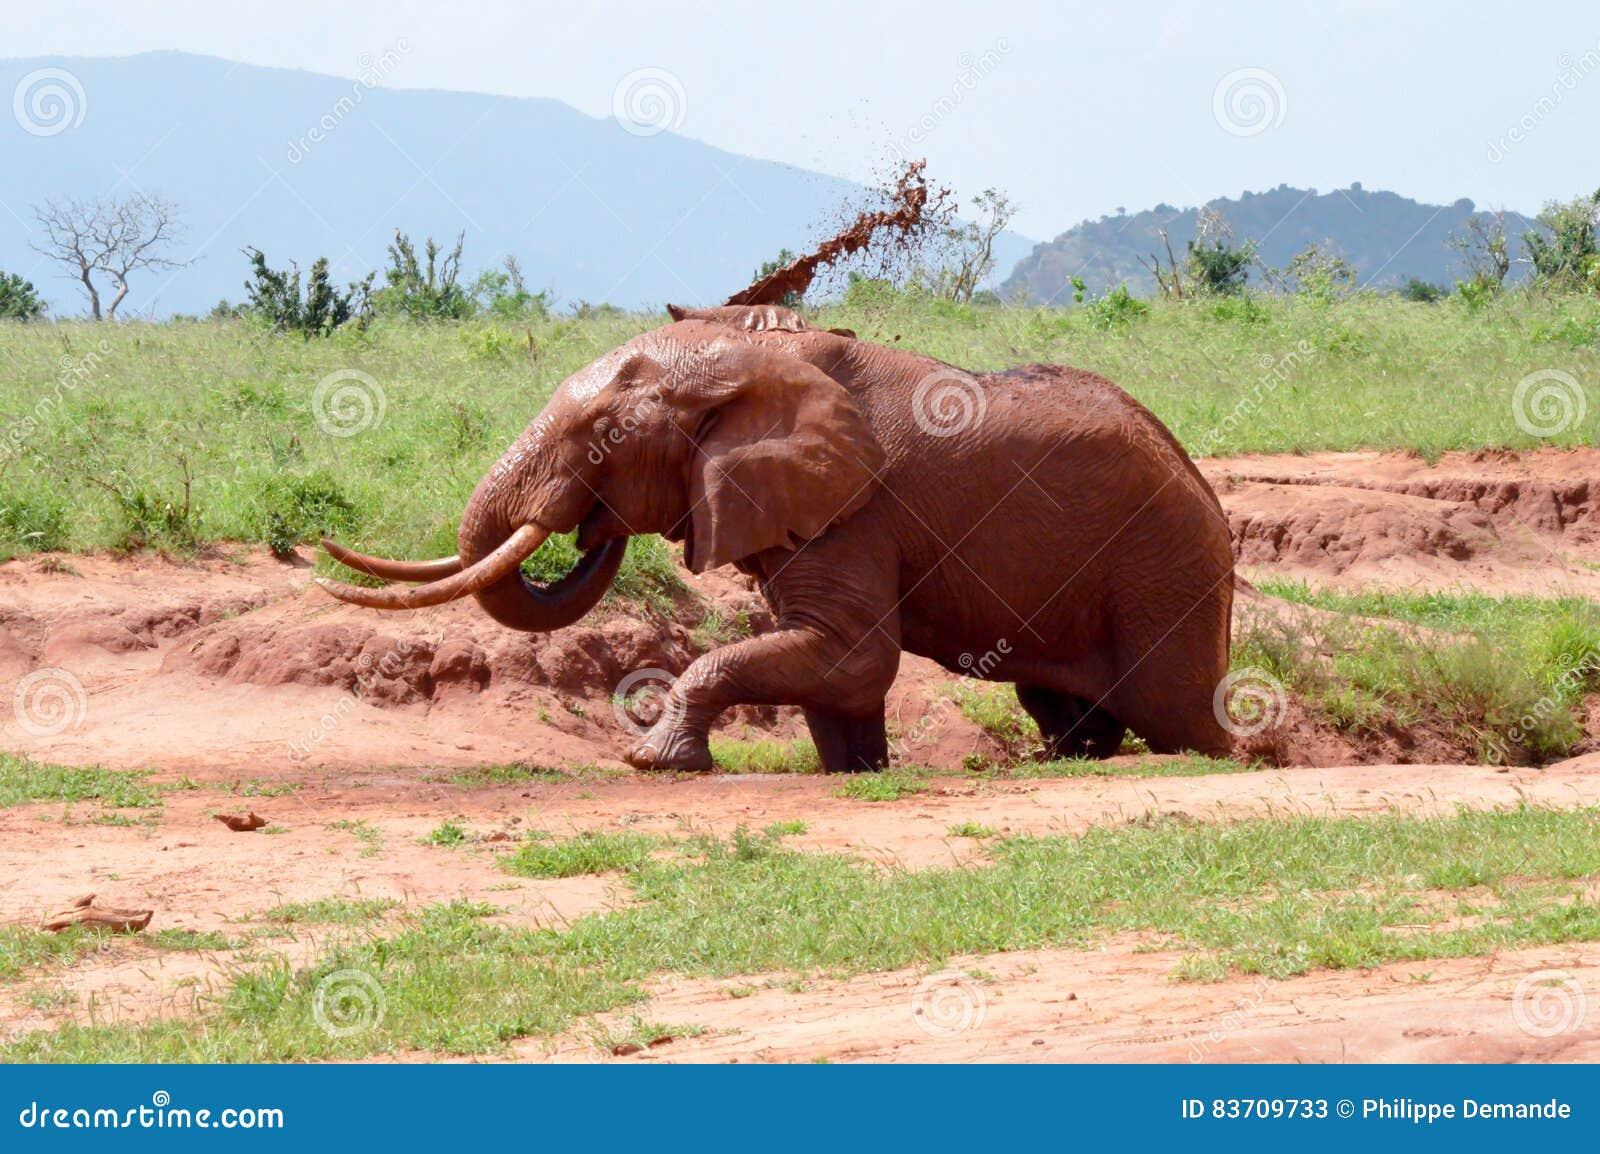 Kenya`s Red Elephant Stock Photo